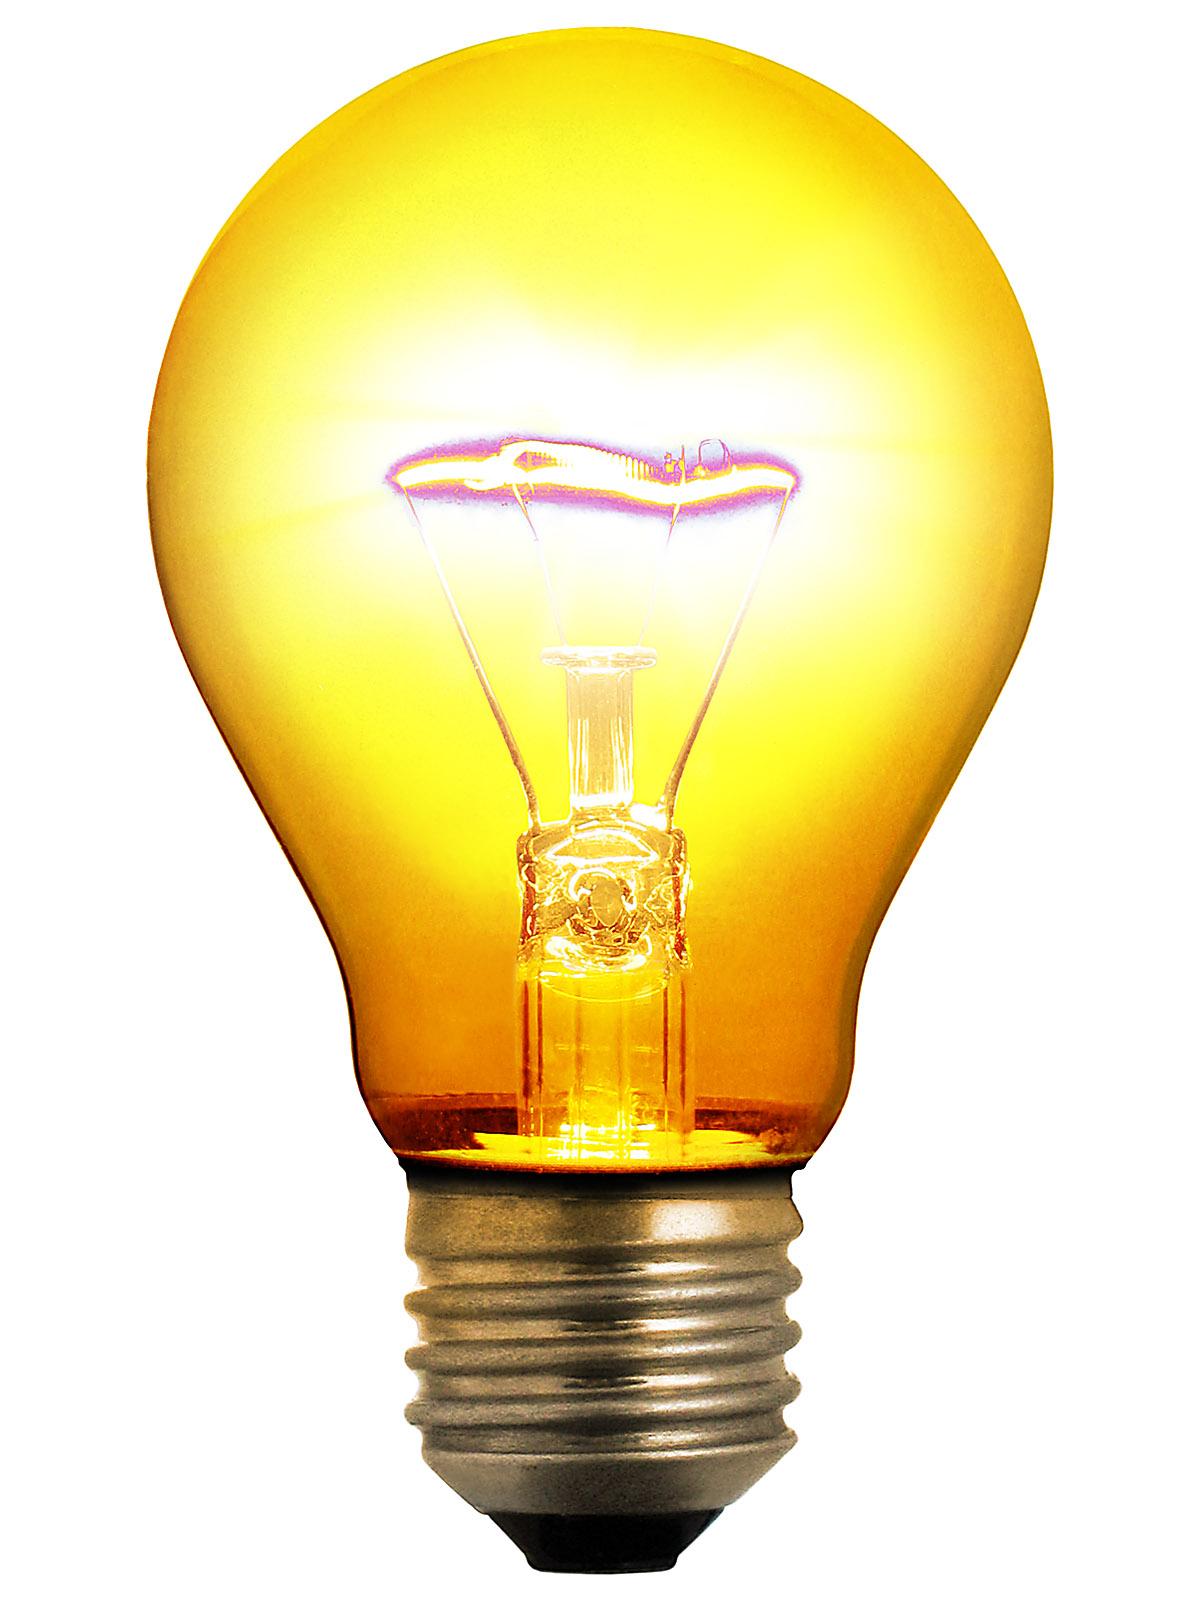 Light-bulb PNG images for Electric Lamp Png  67qdu